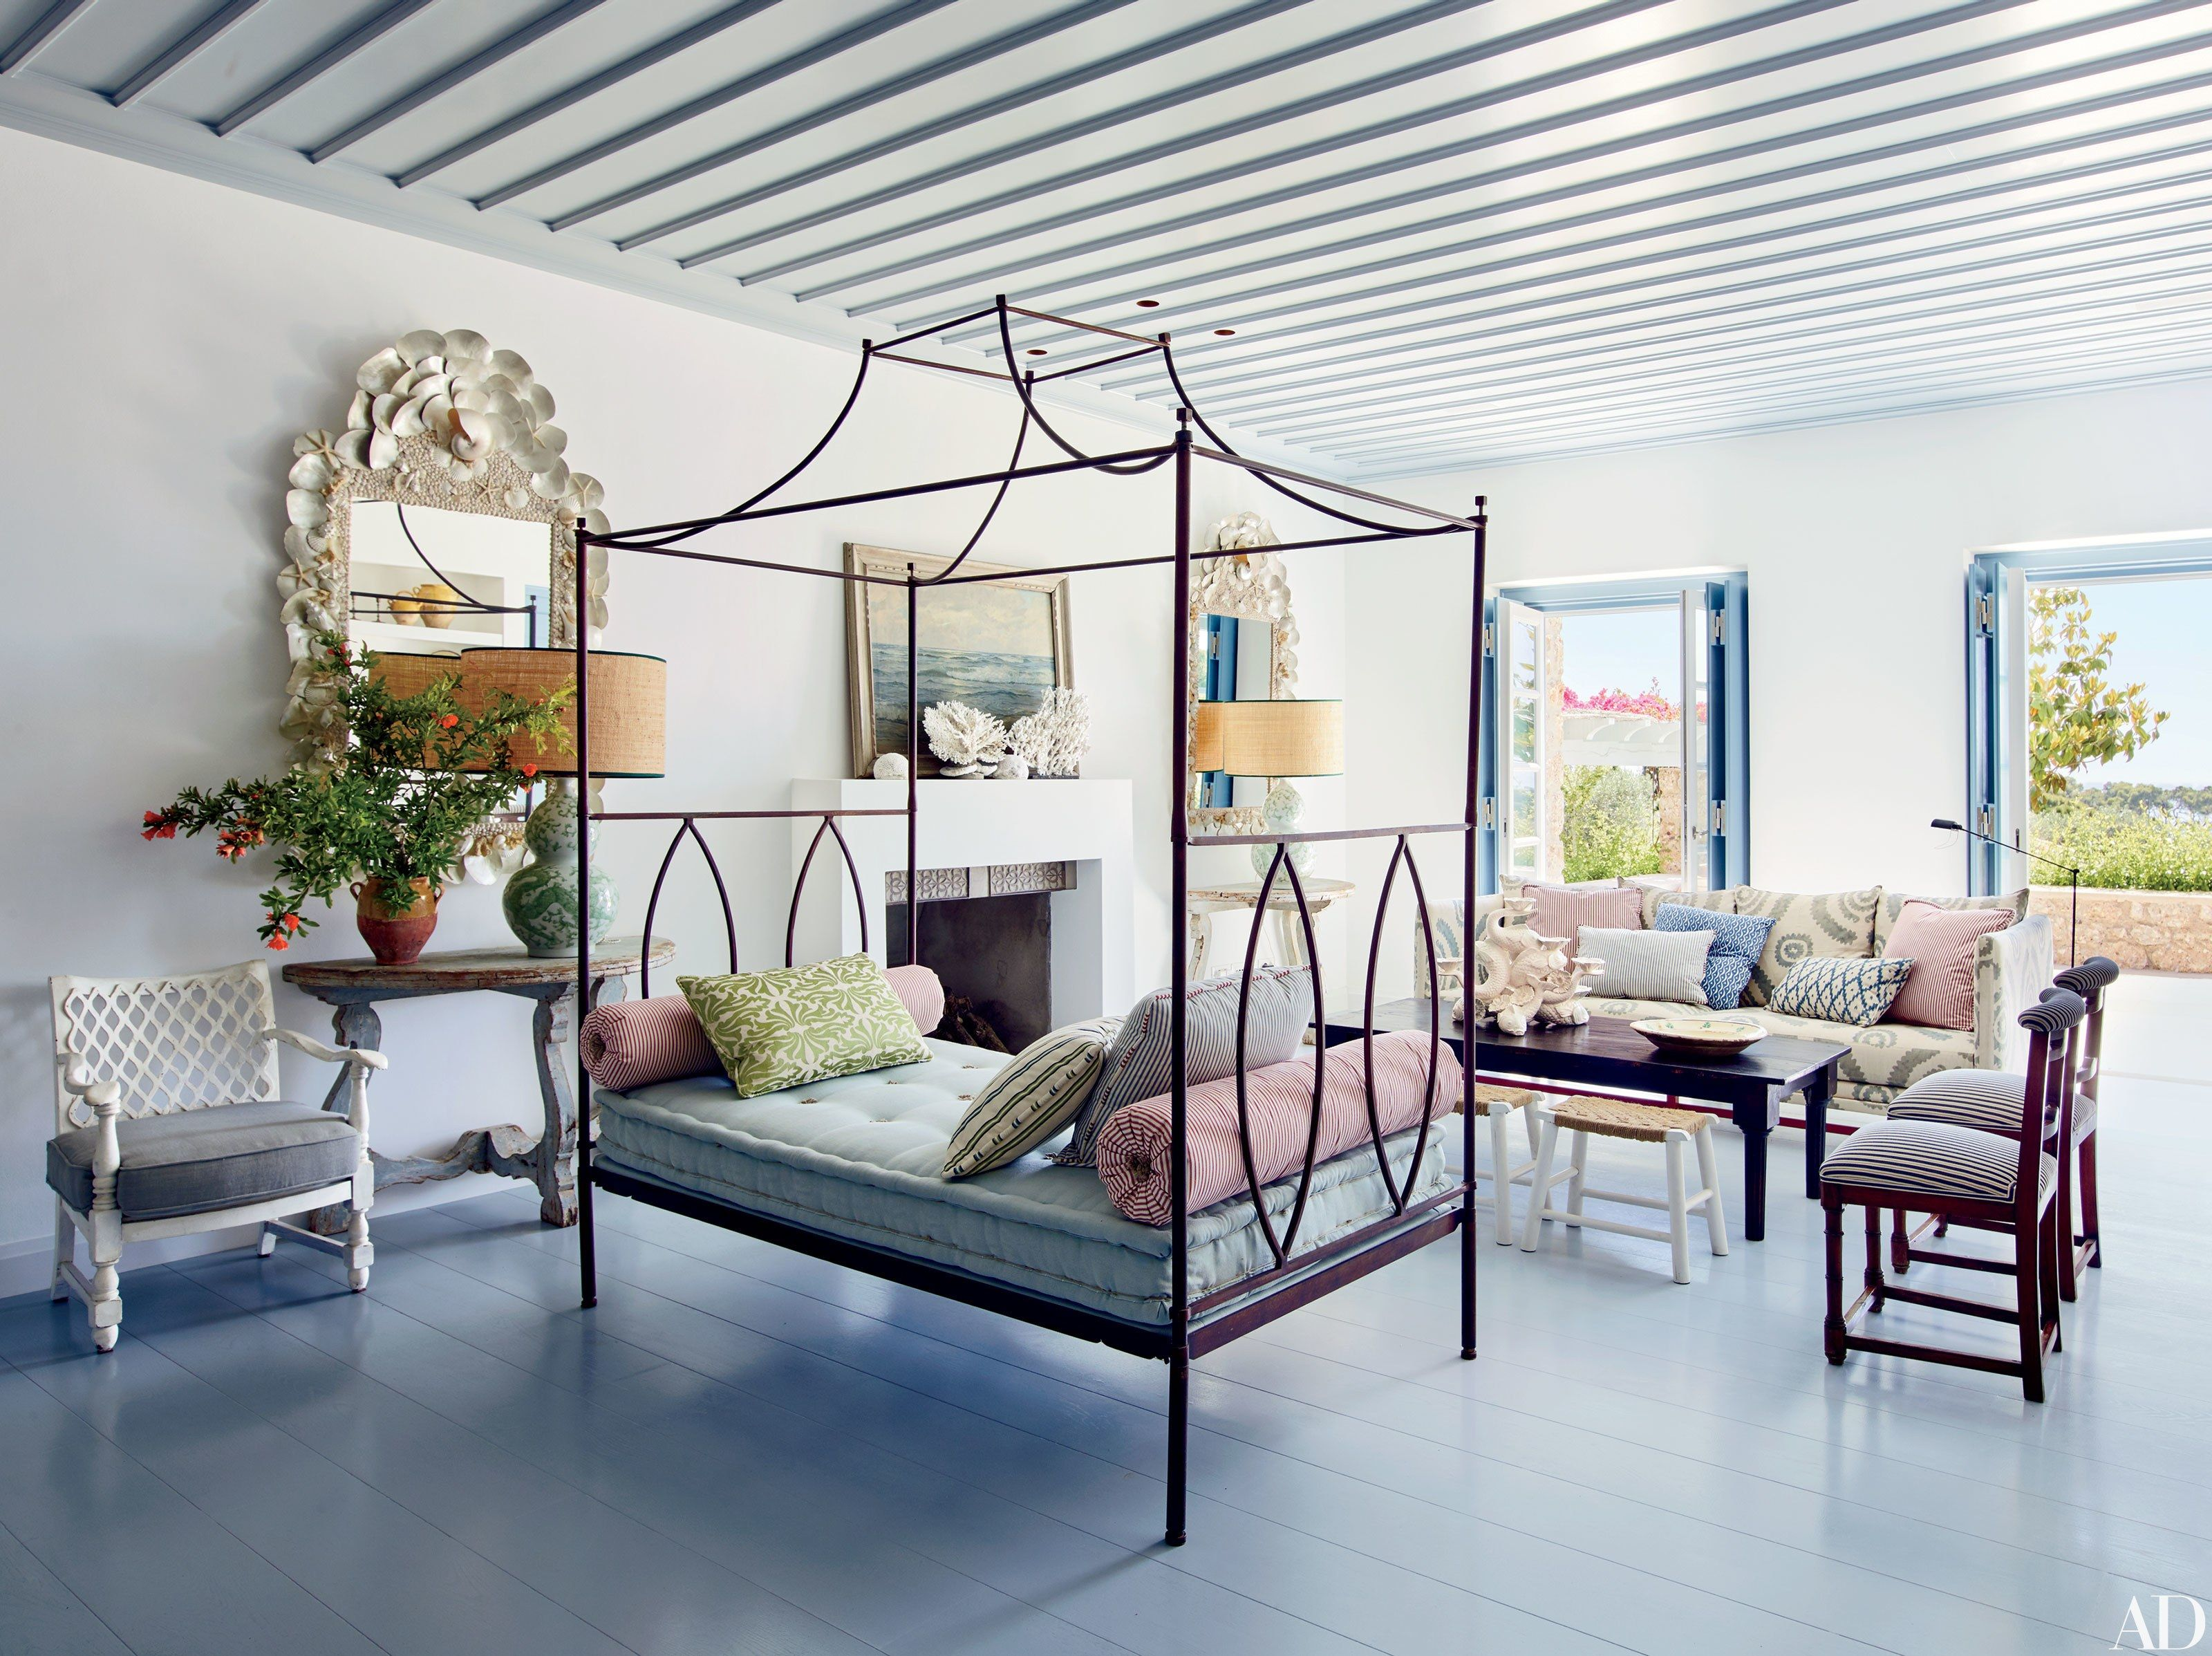 10 Rooms That Do Mediterranean Style Right | Mediterranean style ...